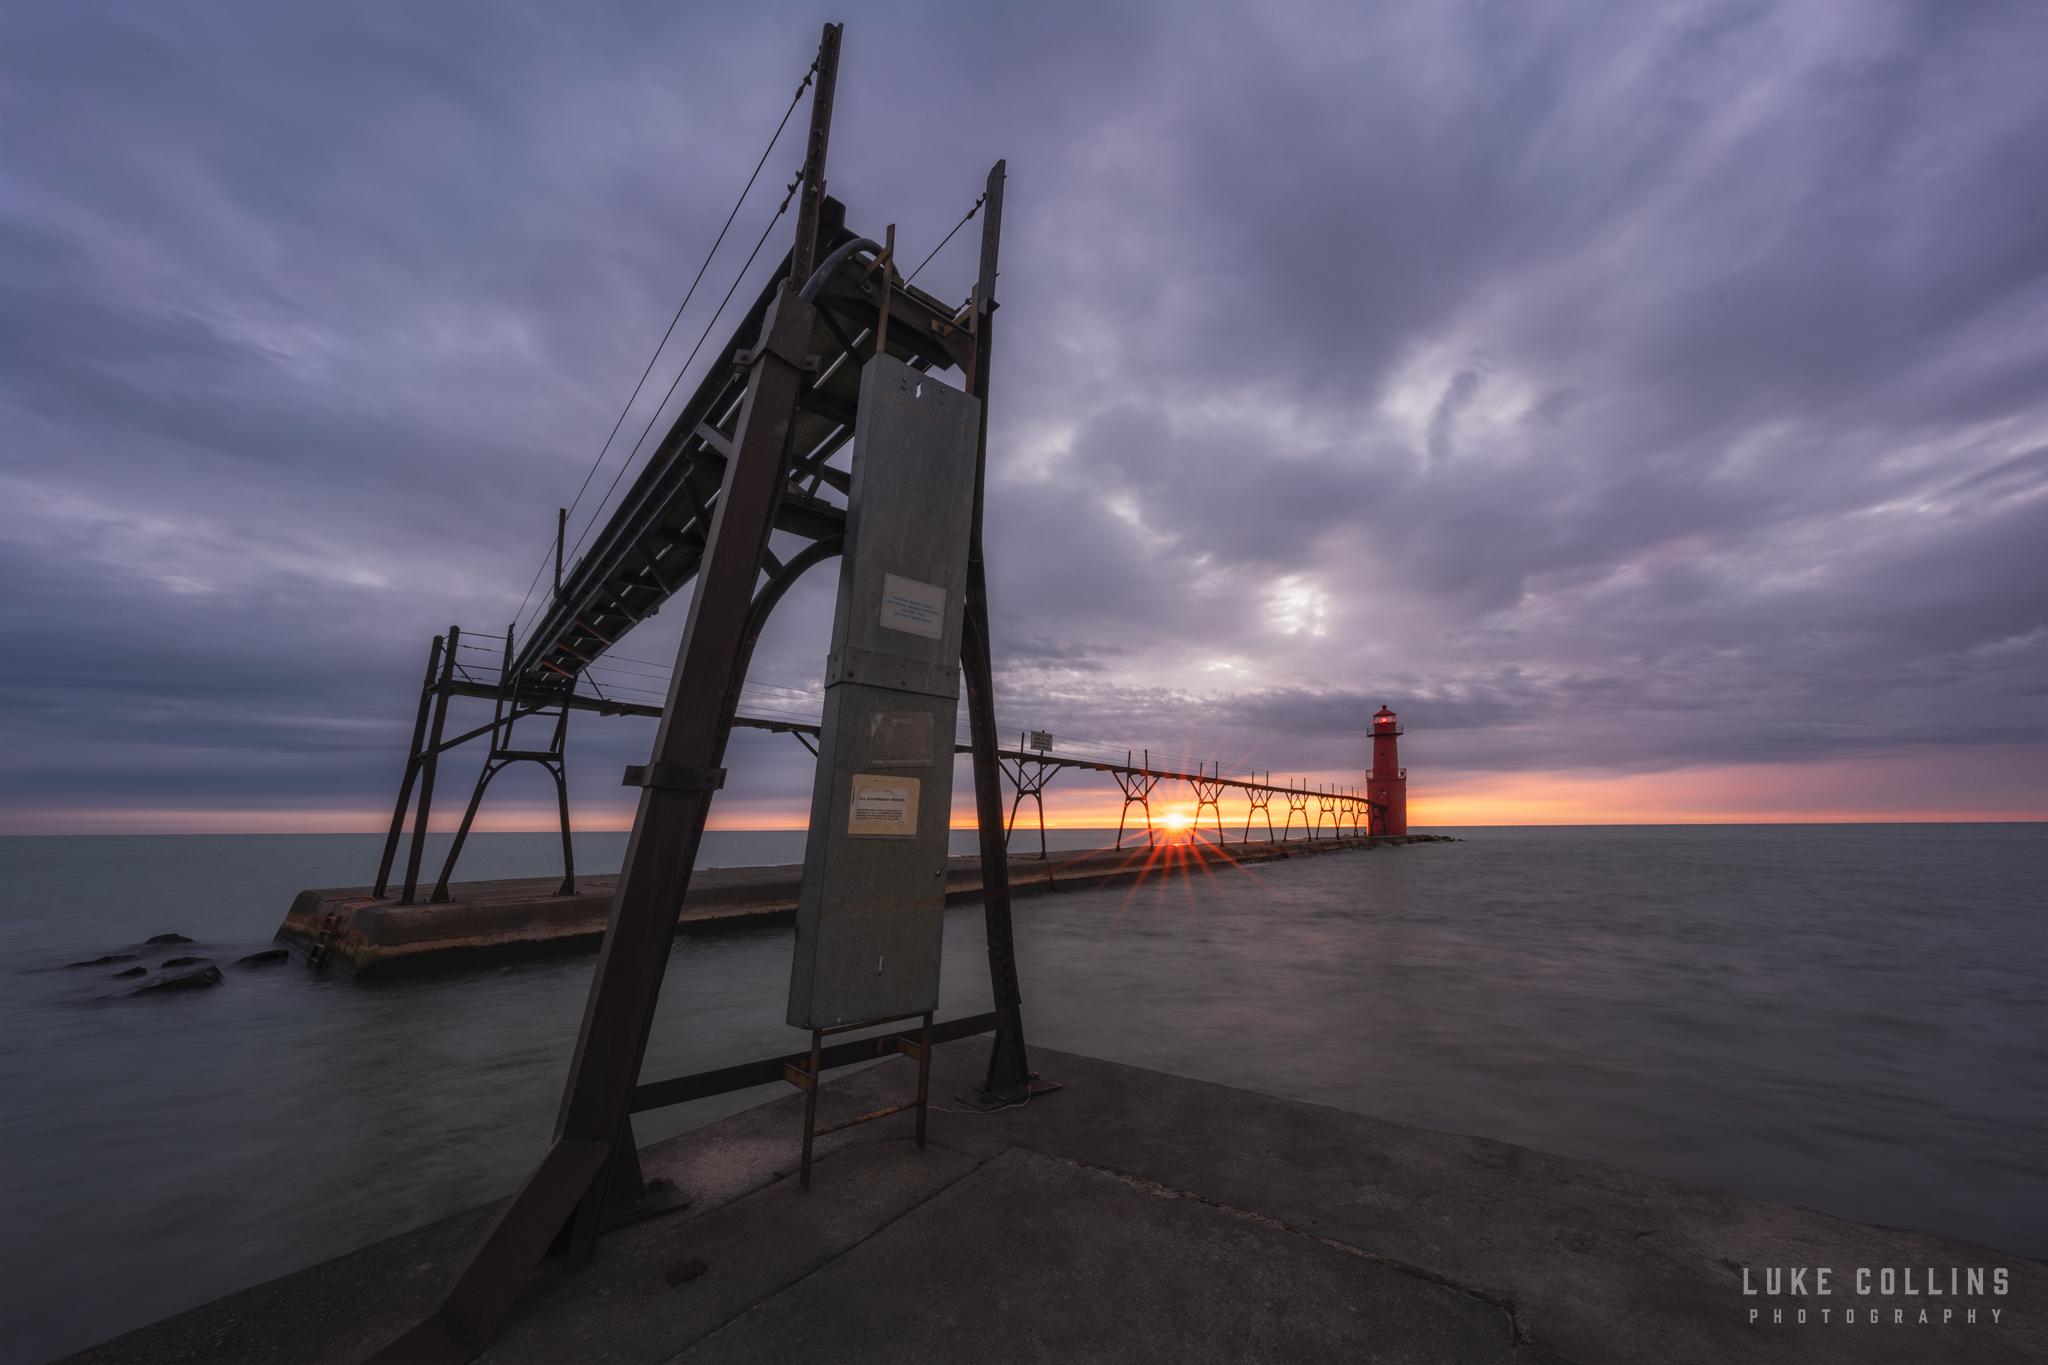 algoma, wisconsin, lake michigan, sunrise, lighthouse, pierhead lighthouse